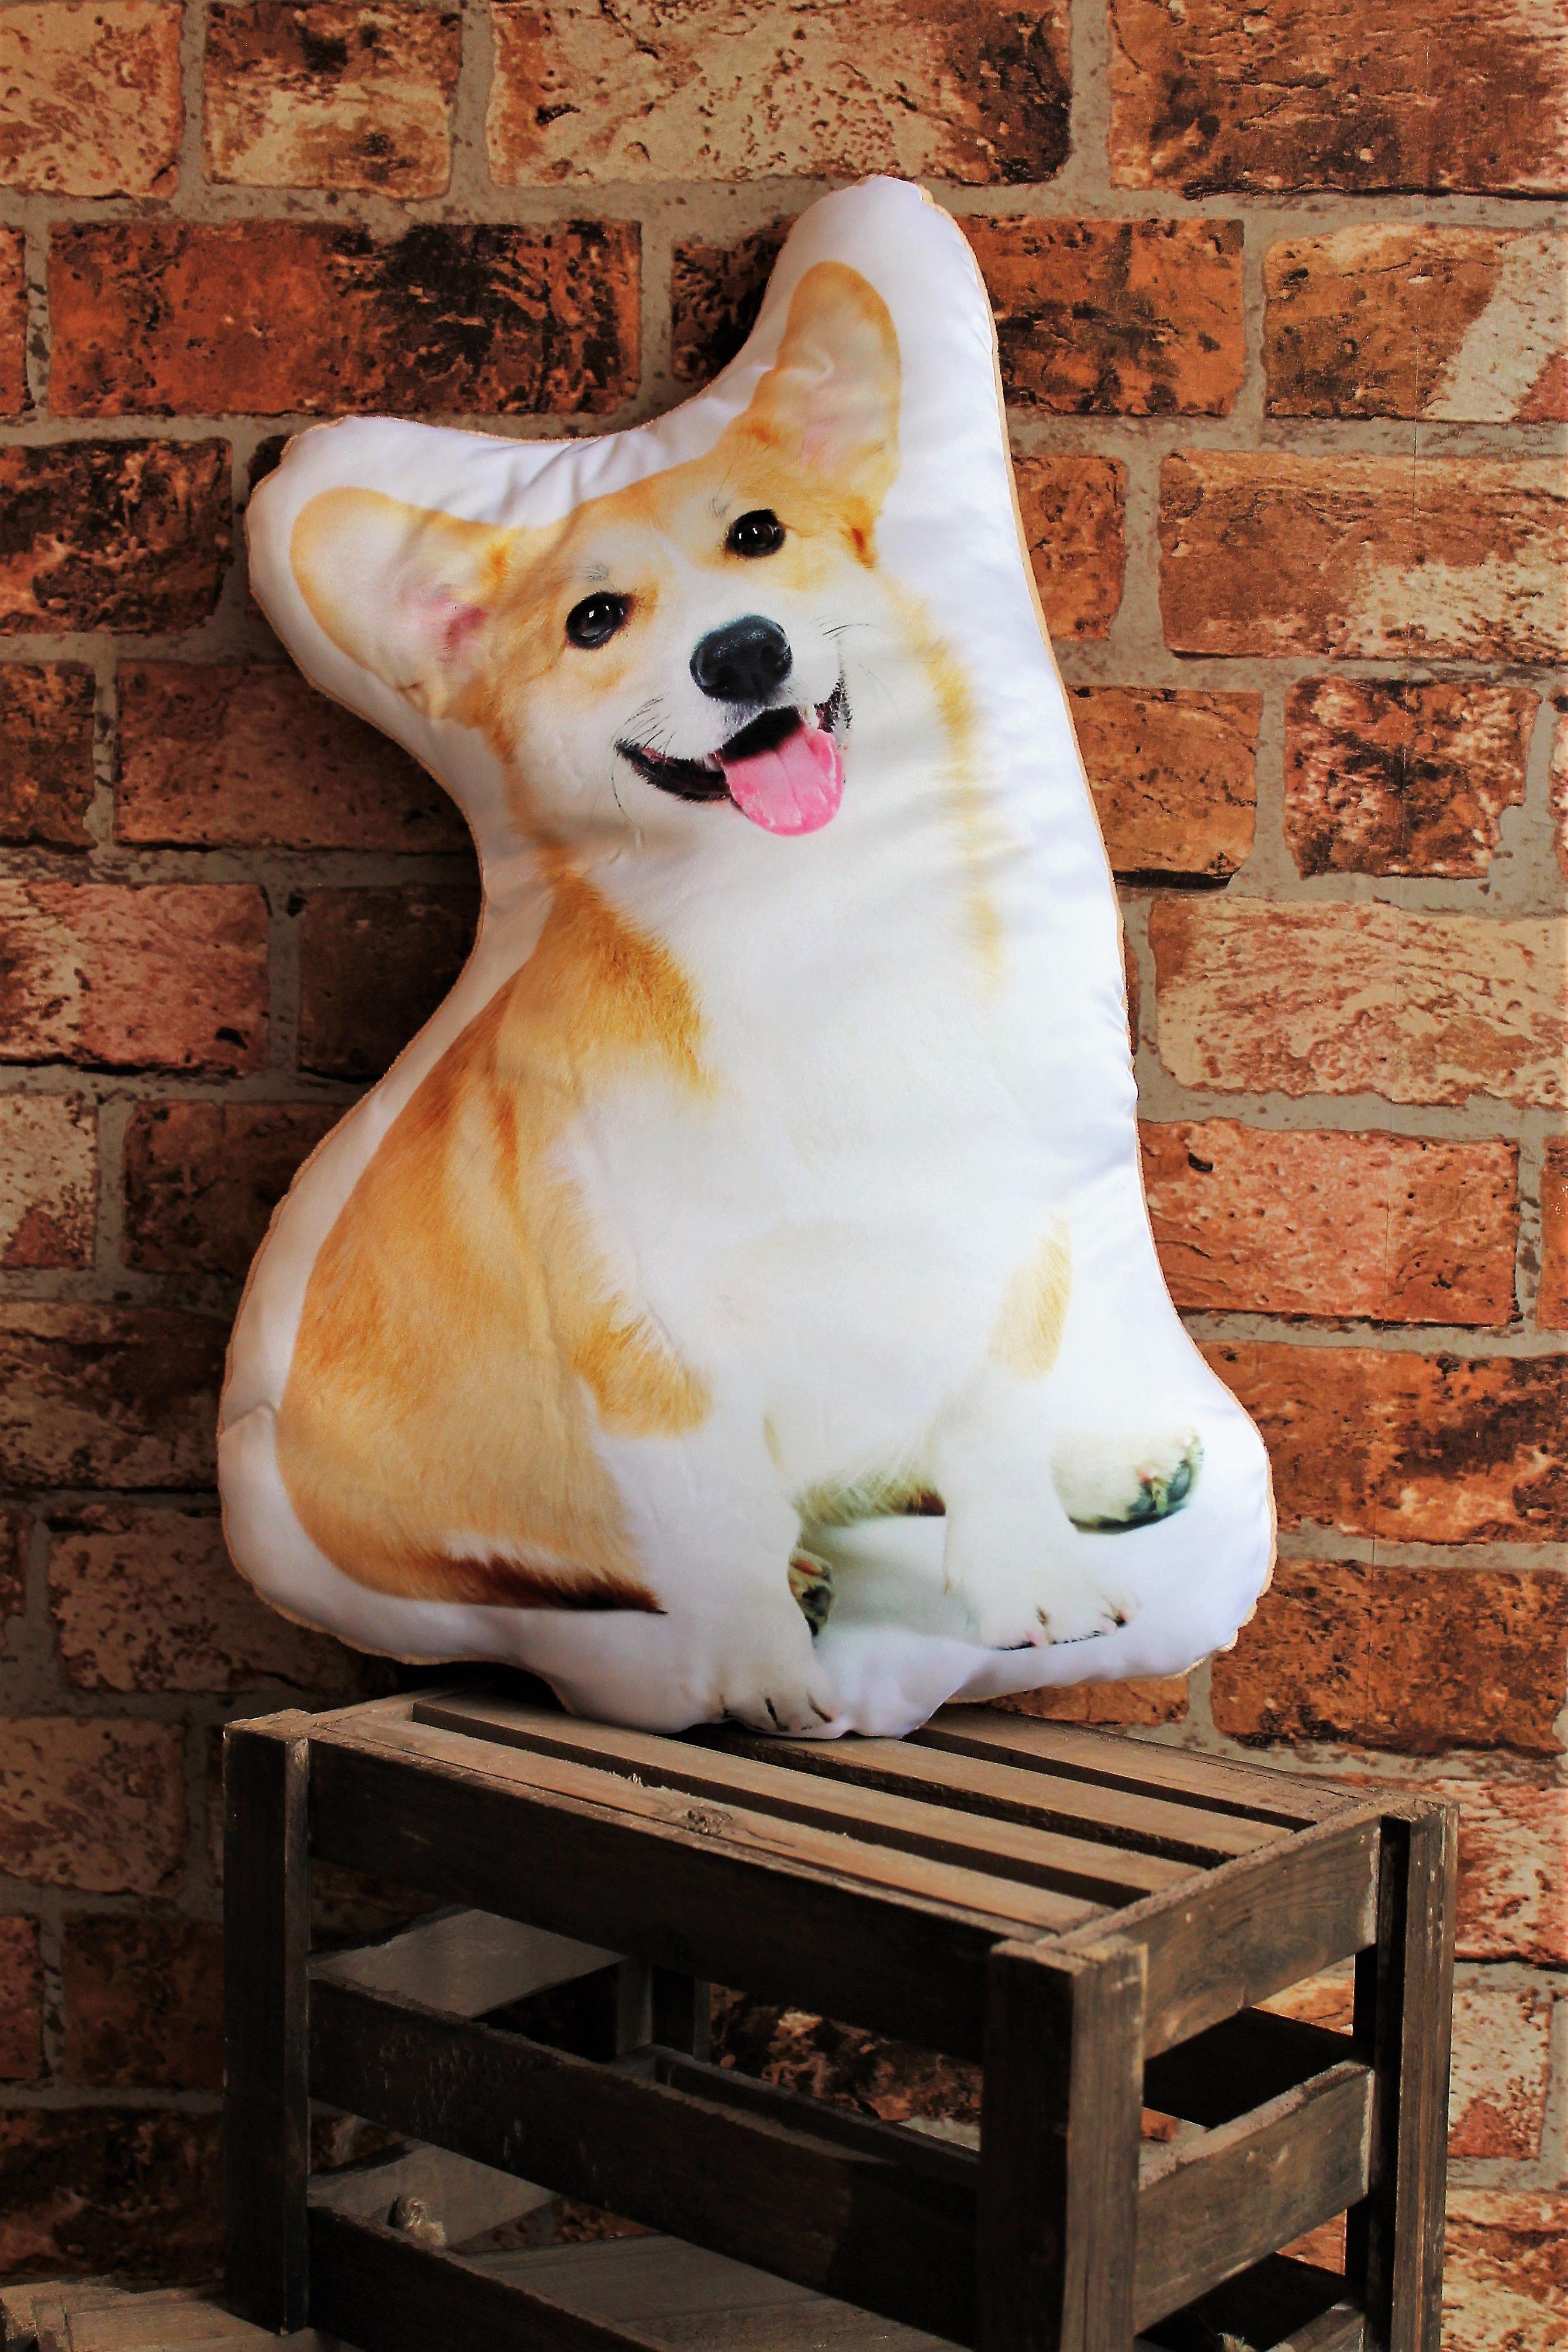 Adorable corgi shaped cushion